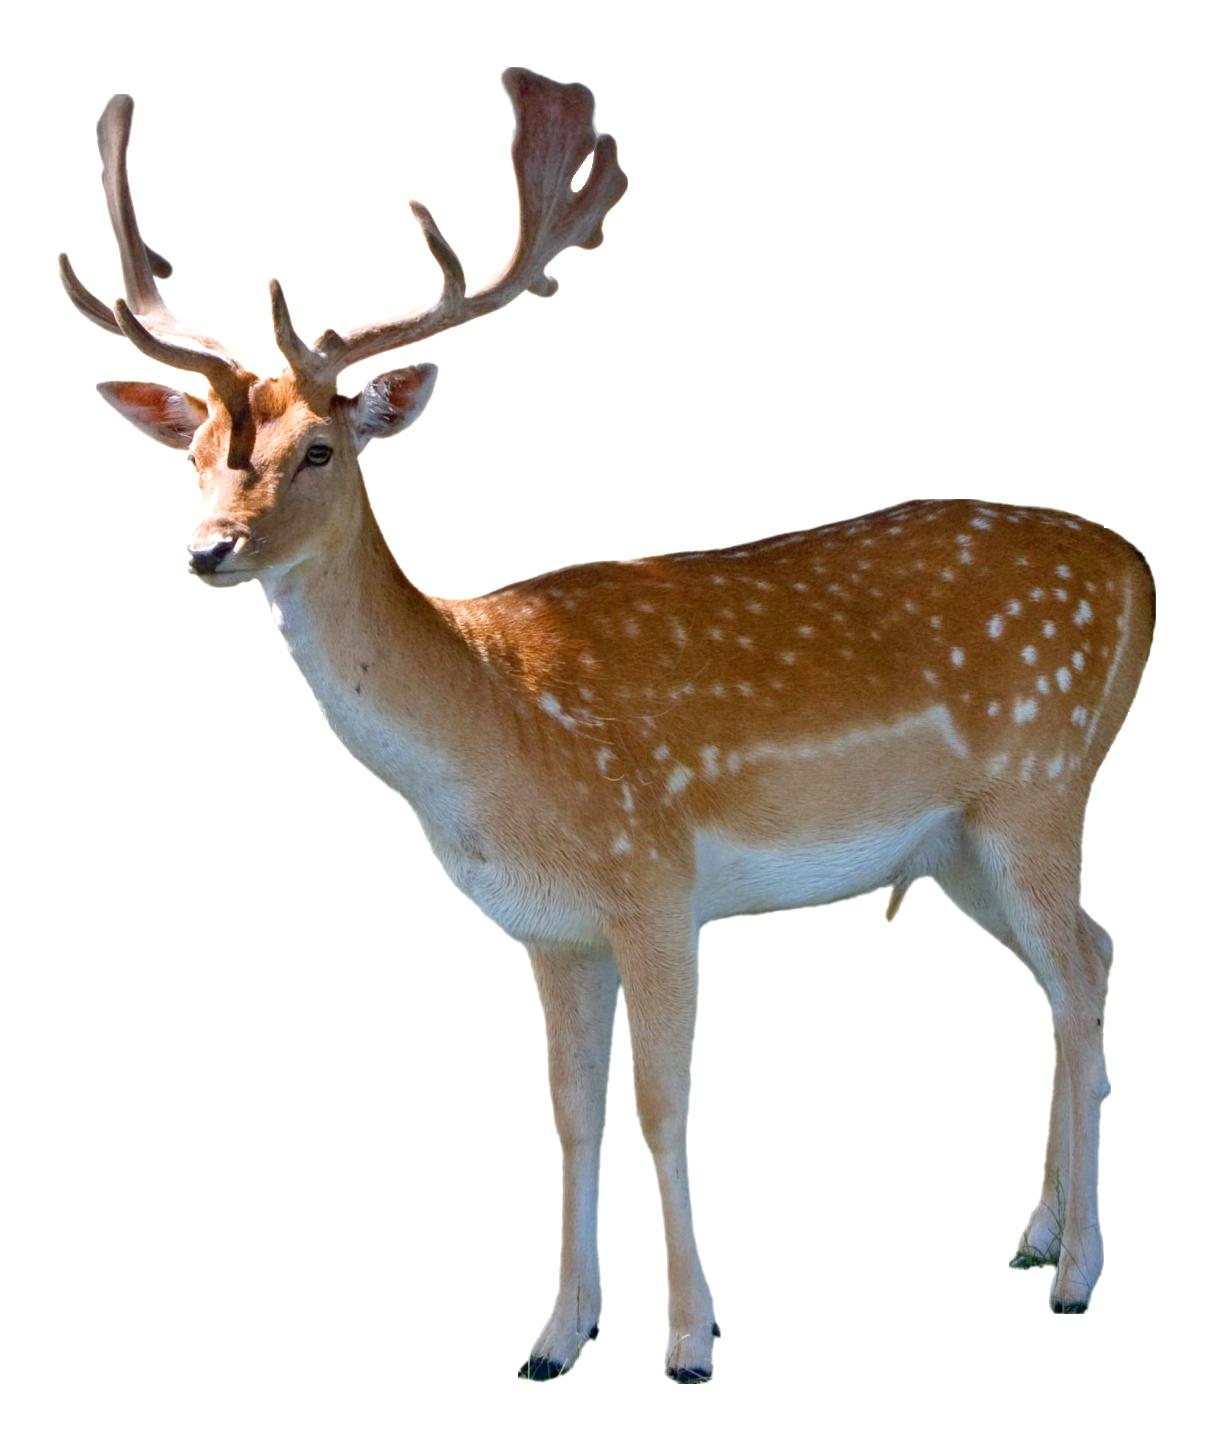 Deer Png Image Purepng Free Transparent Cc0 Png Image